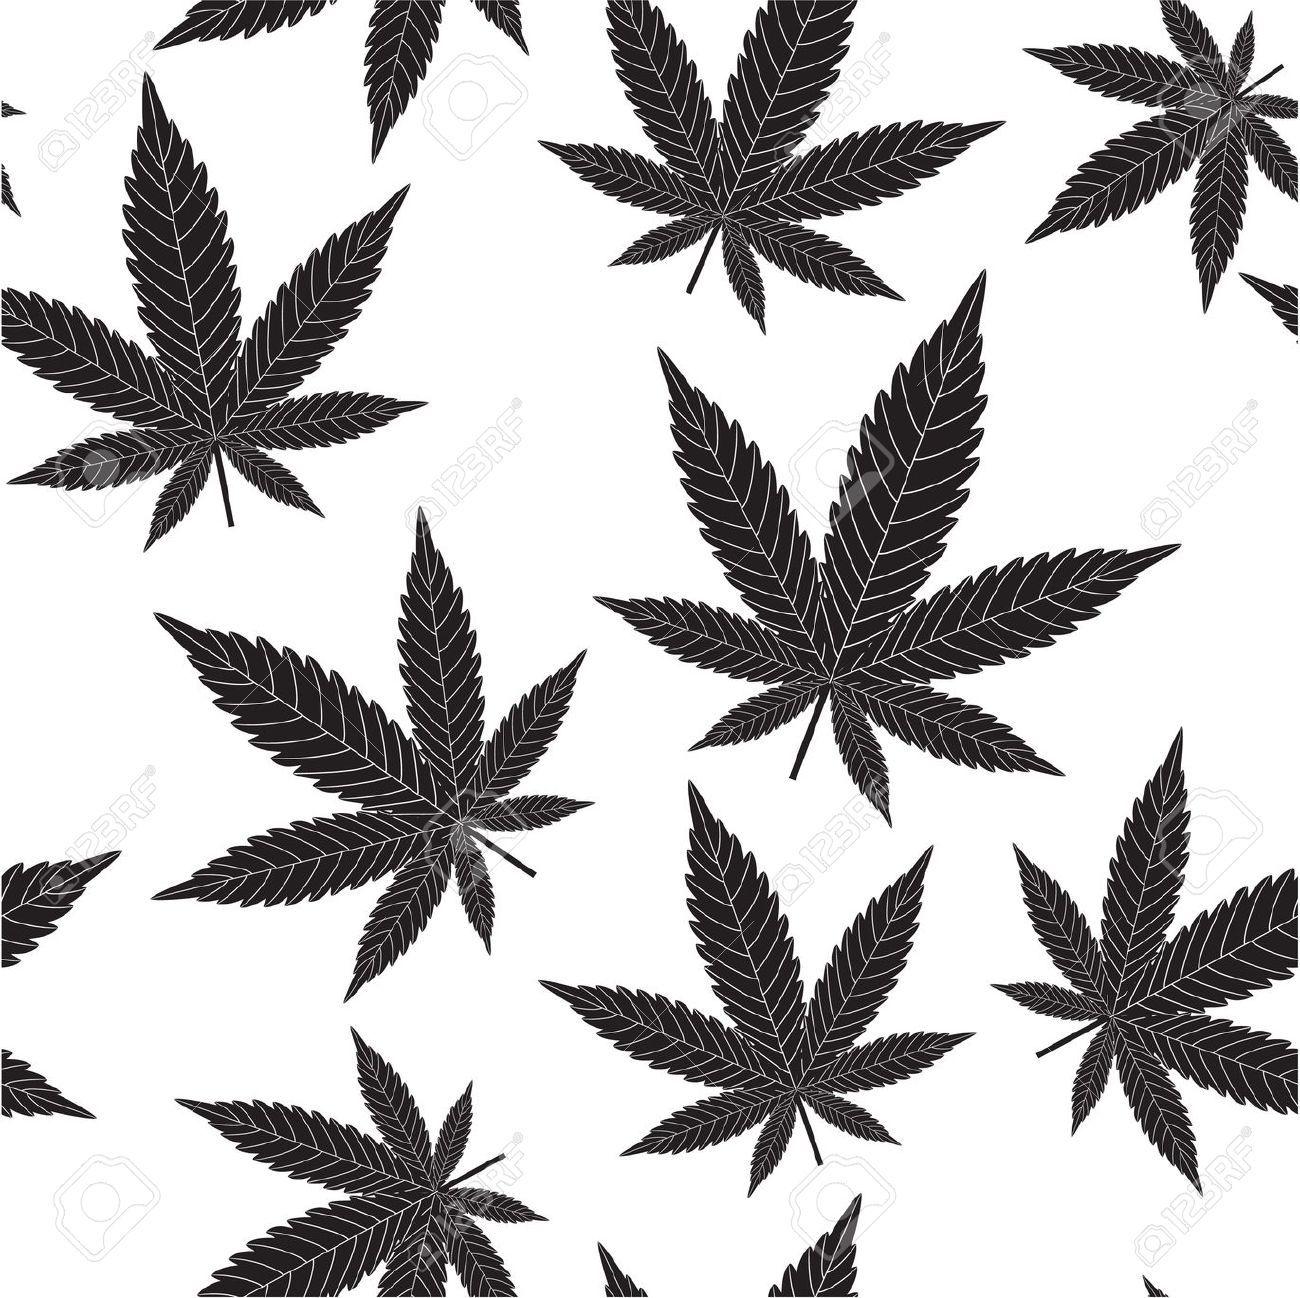 Cannabis Sativa Seamless Pattern Of Leaves